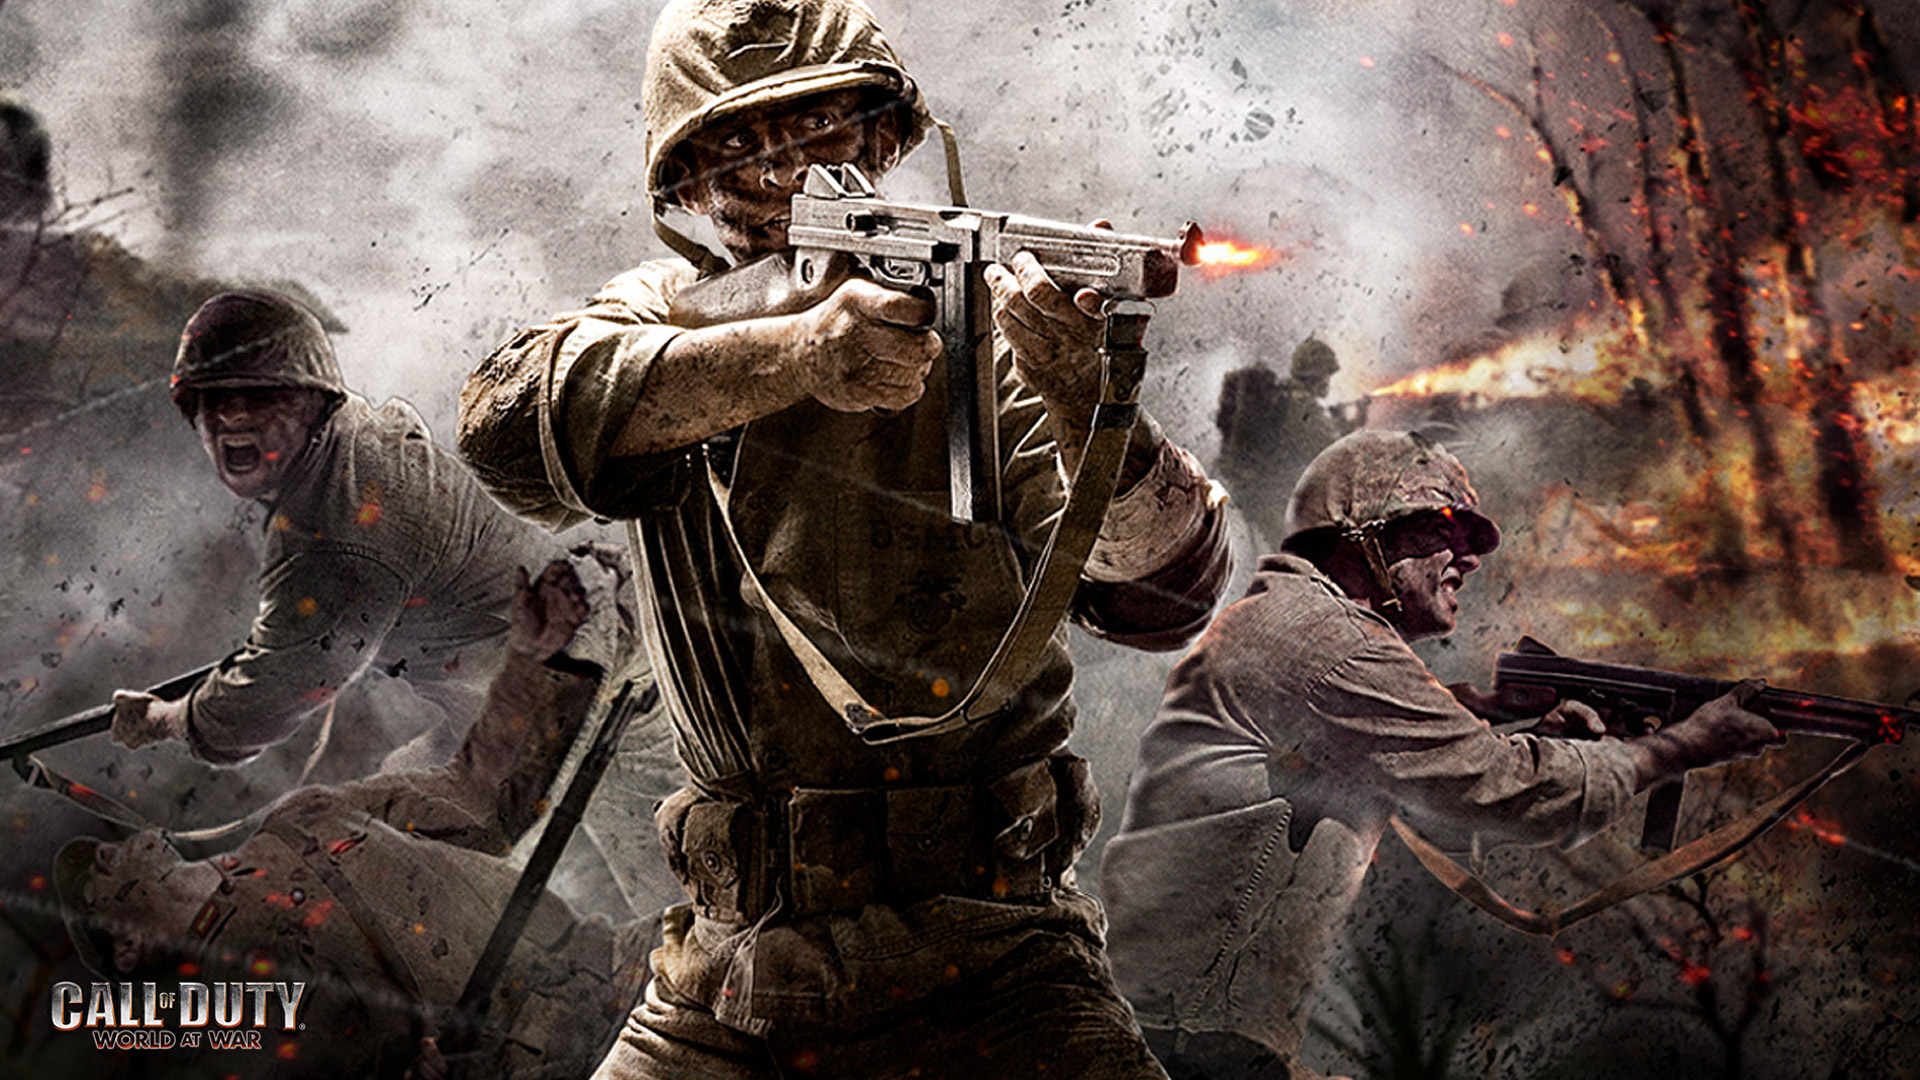 HD Call Of Duty World At War Wallpapers